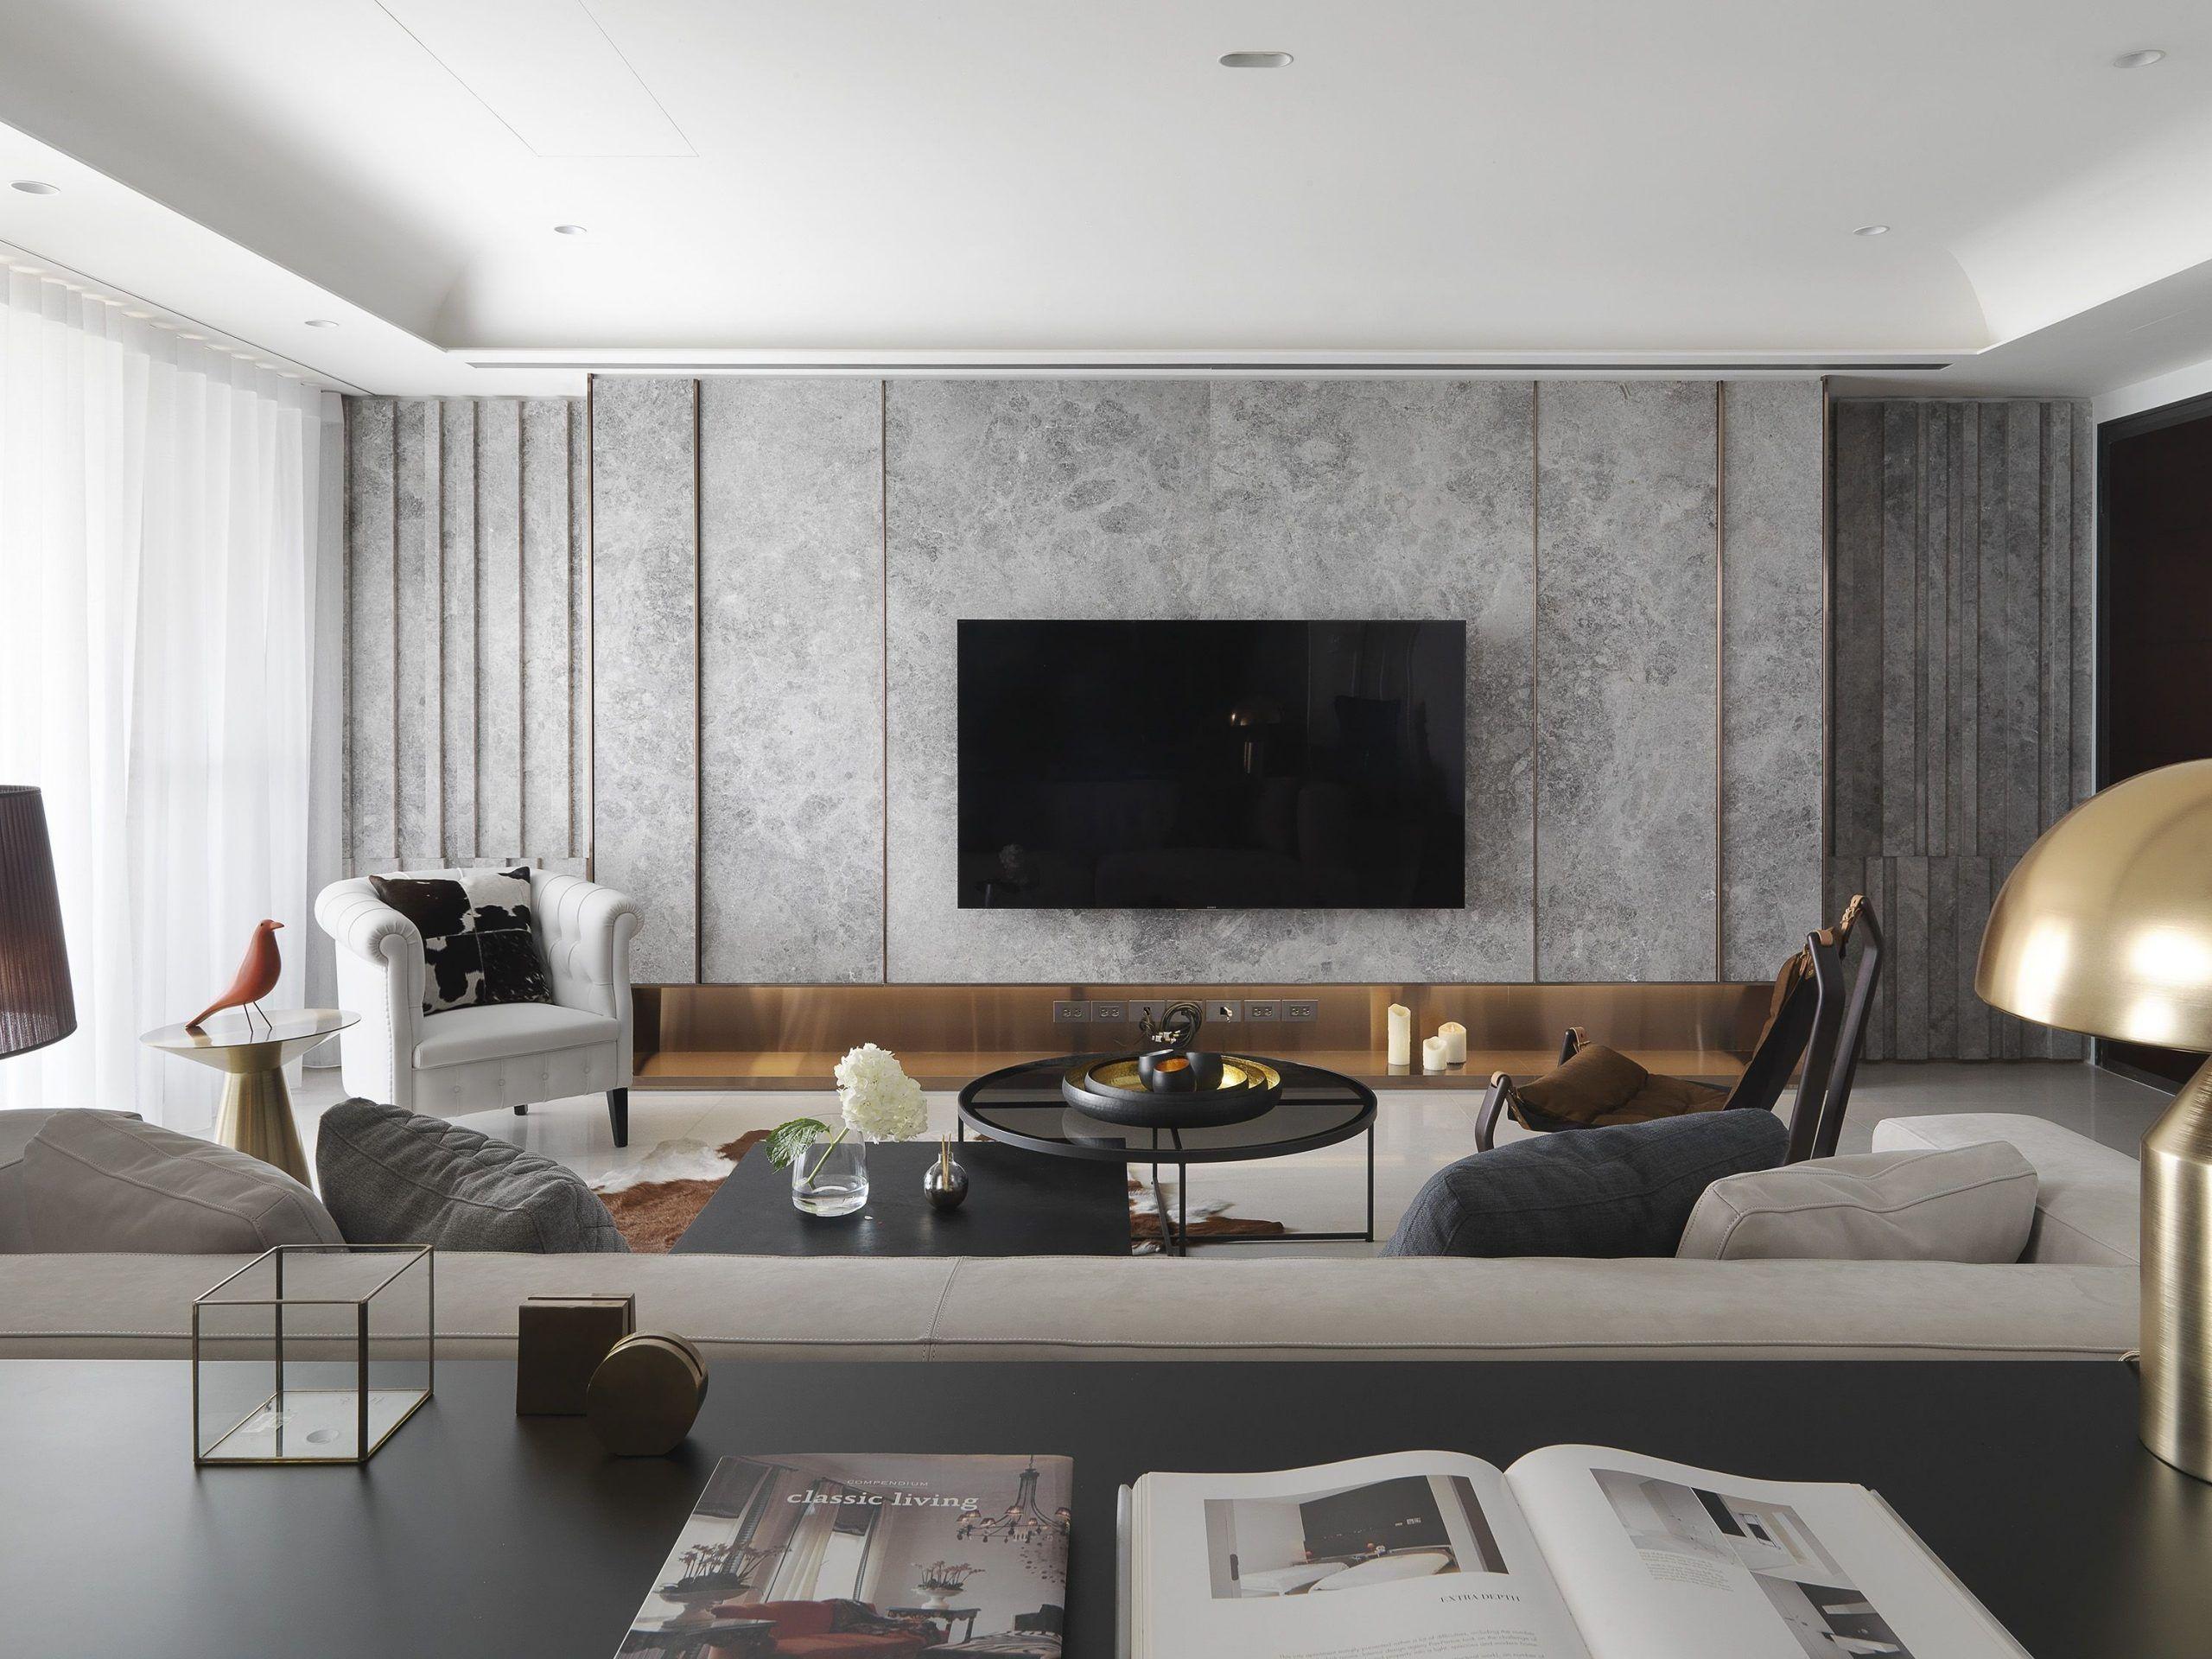 30 Interesting Home Design Ideas Uk Living Room Inte